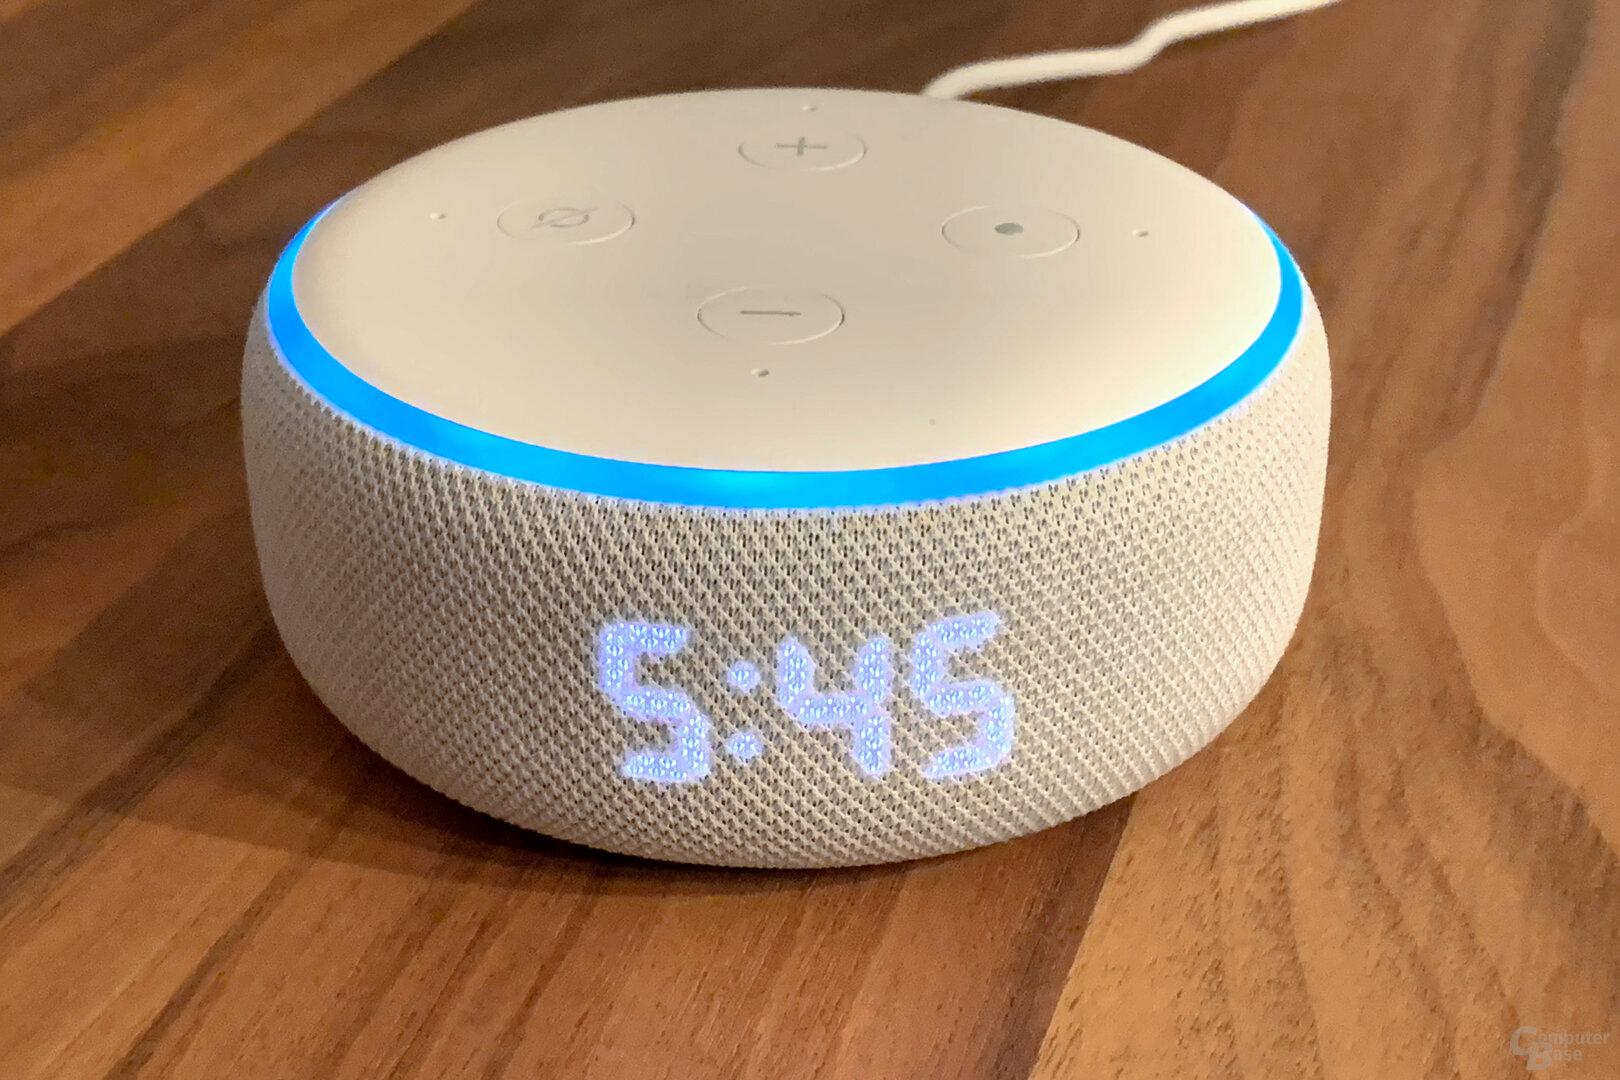 LED-Display des Amazon Echo Dot mit Uhr